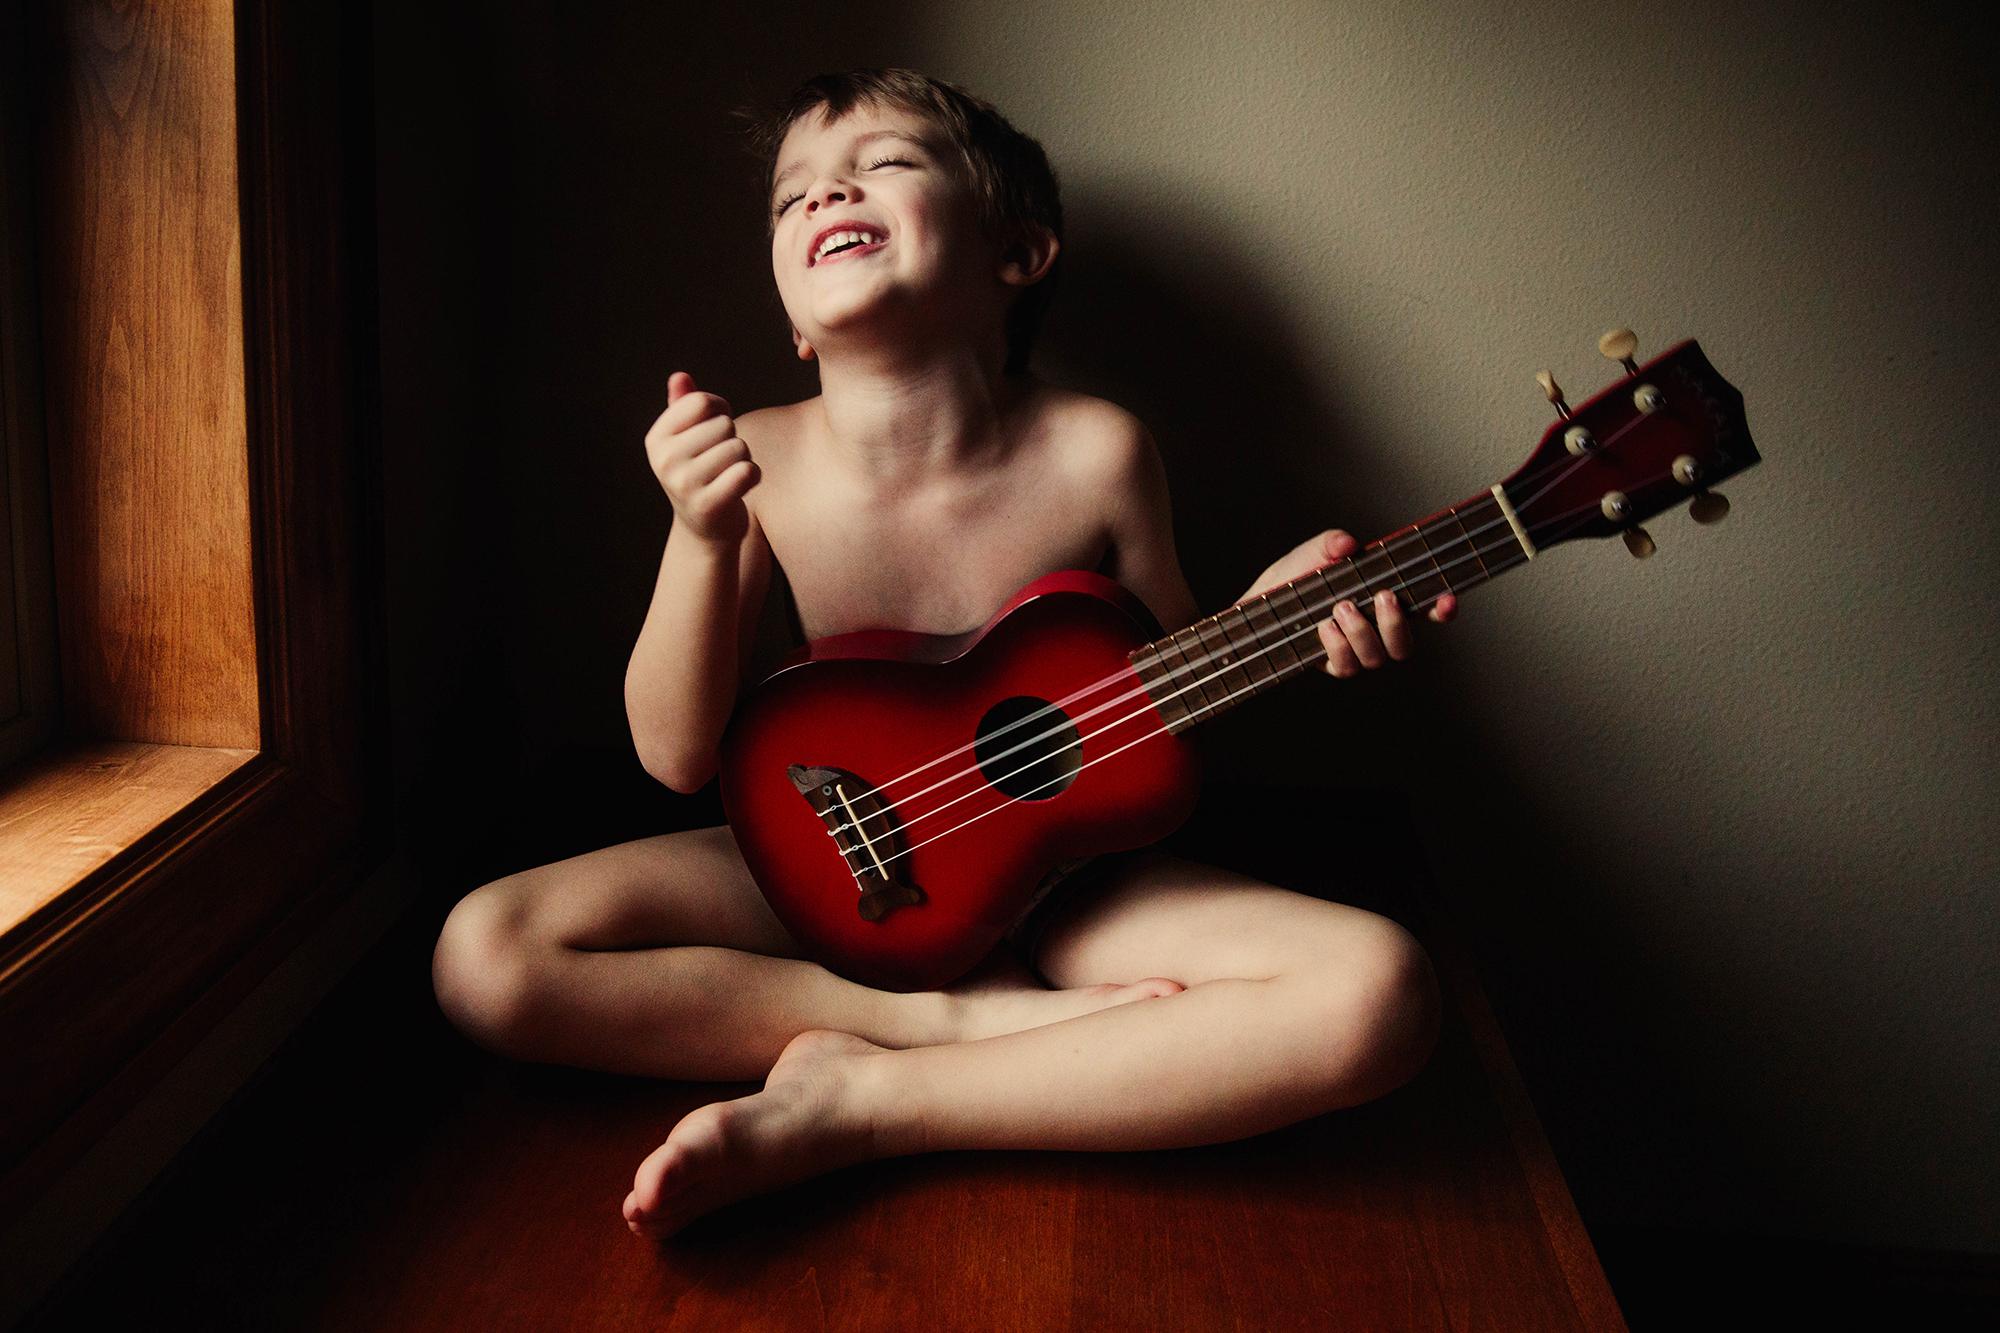 Dana-Leigh_The-Illuminated-Artist-Click-Photo-School0024